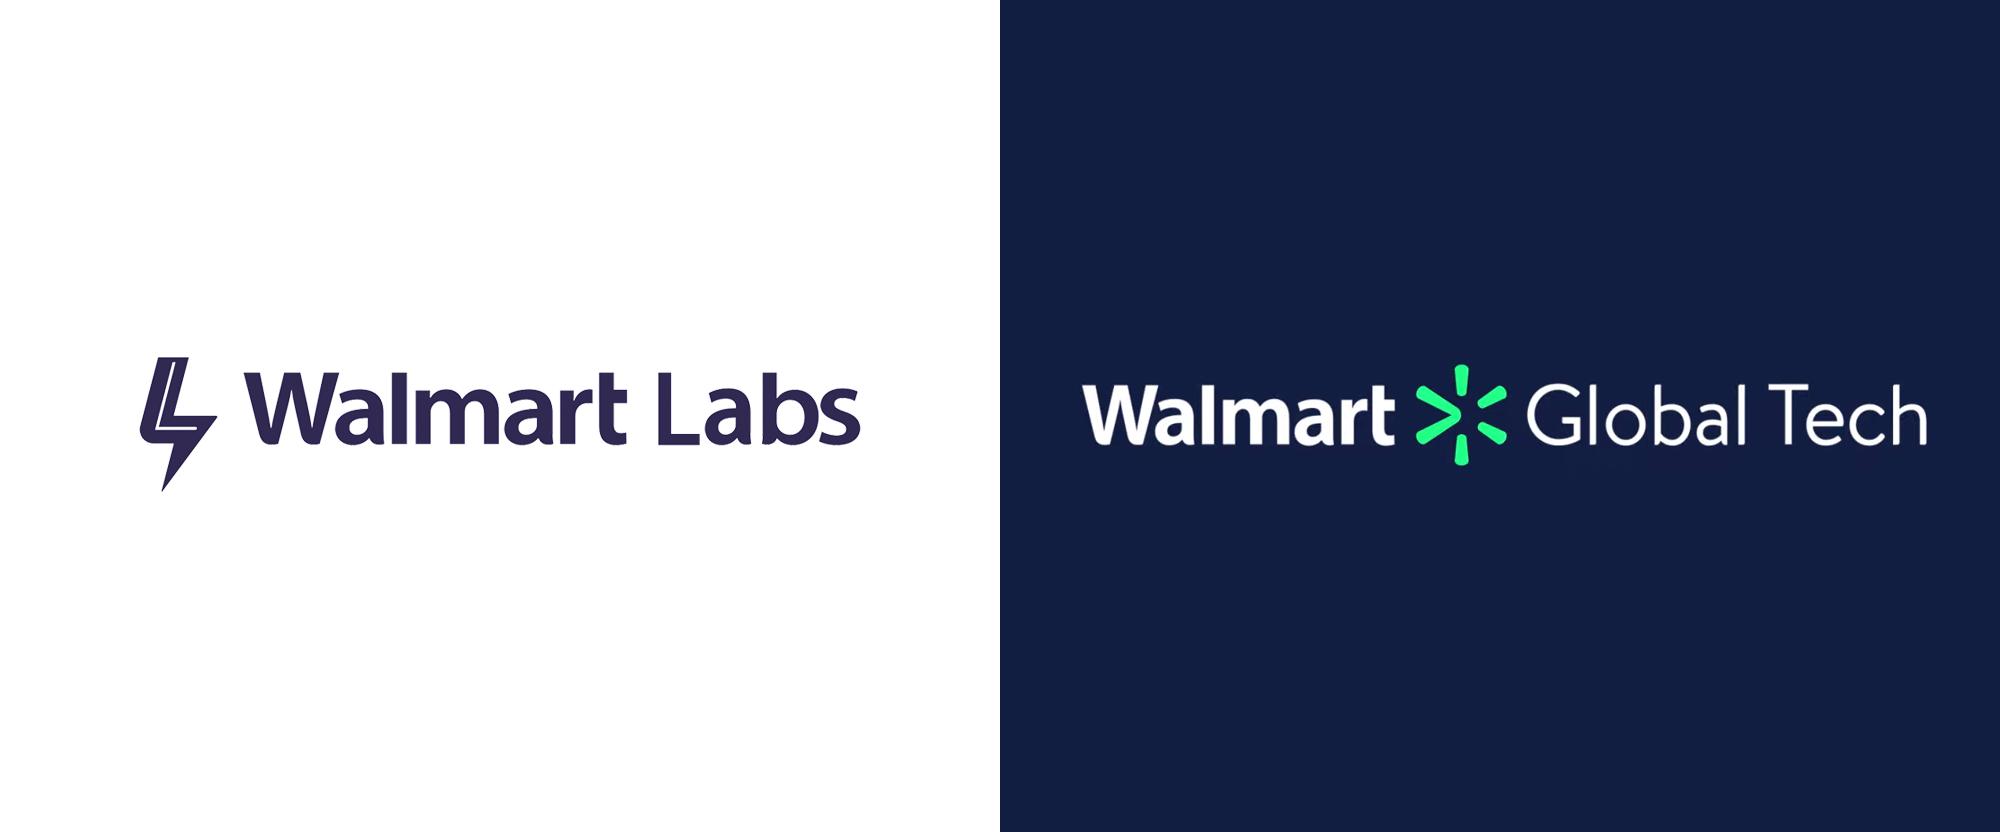 New Name and Logo for Walmart Global Tech